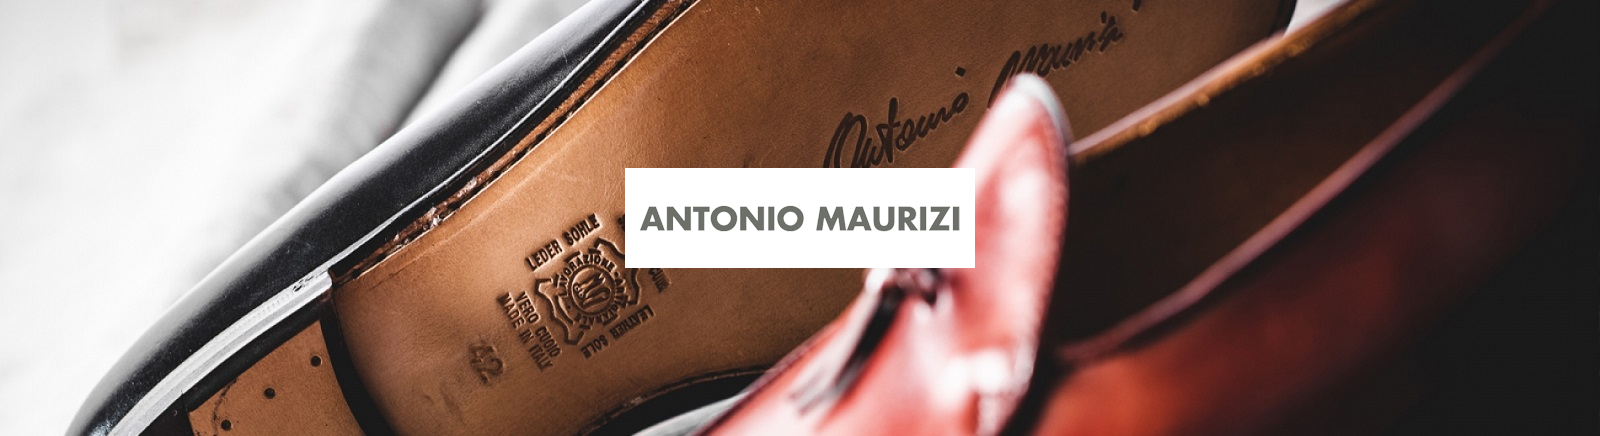 Gisy: Antonio Maurizi Winter Boots für Damen online shoppen